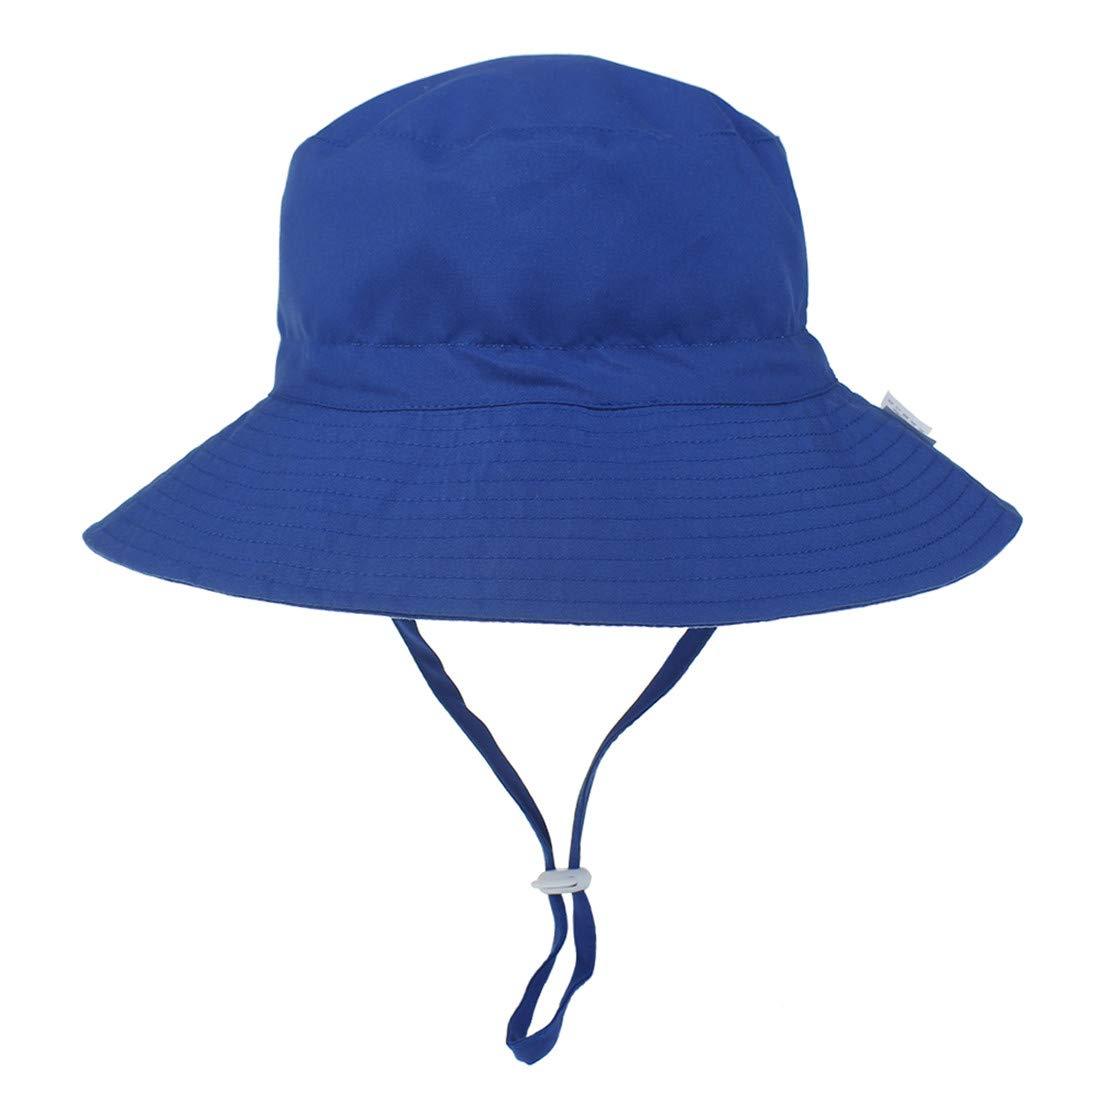 Sun Protection Baby Boy Hats Toddler Sun Hats Cap for Girl Baby Kid Bucket Hat Bonvince Baby Sun Hat Summer Beach UPF 50